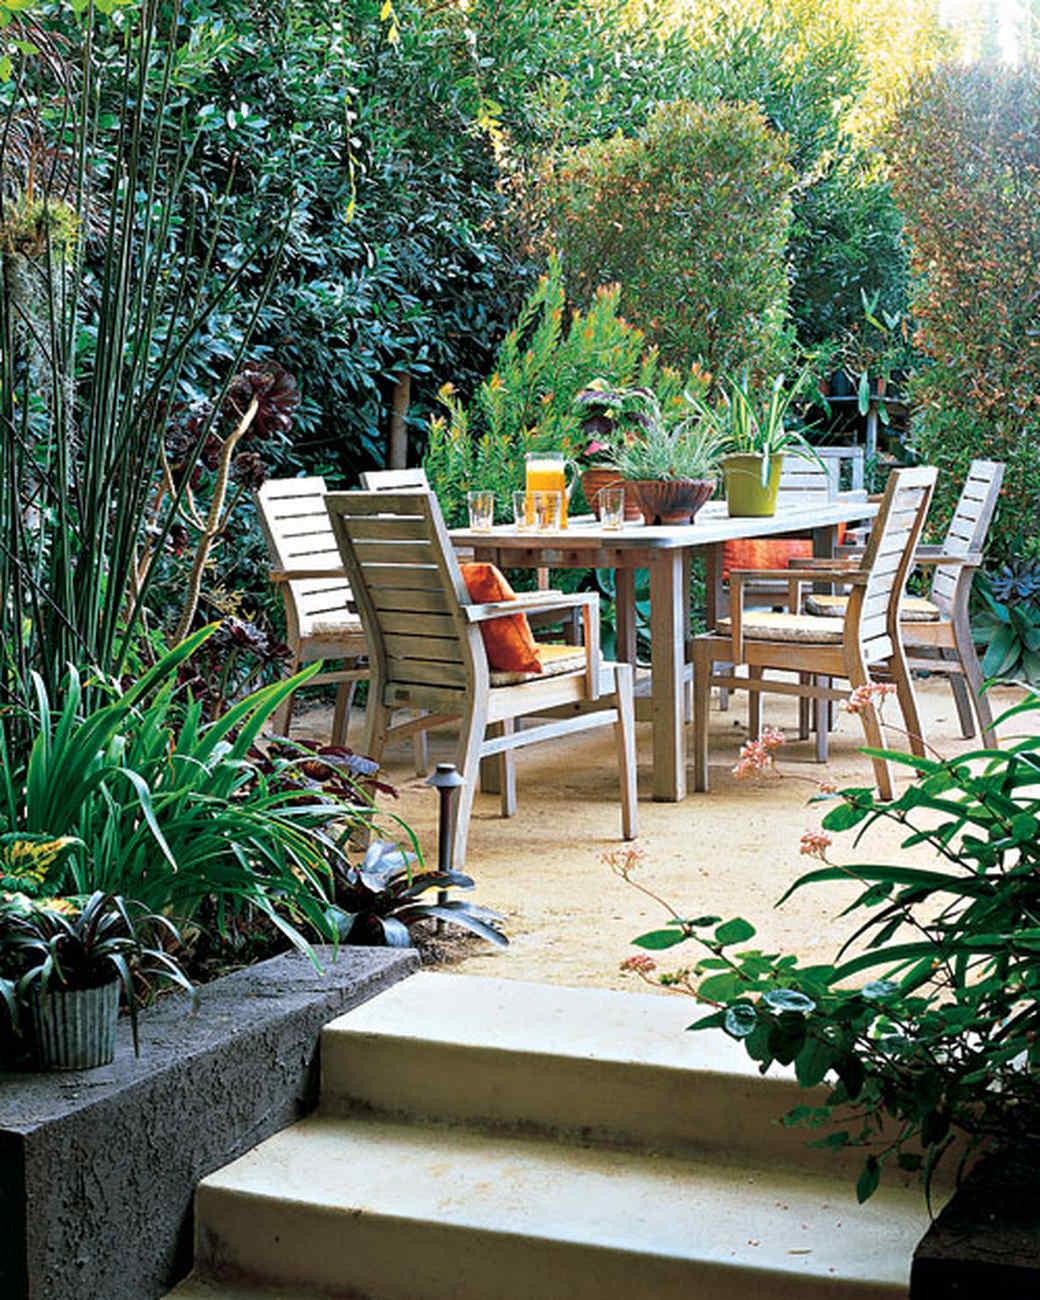 mla10351_sept2008_garden06.jpg